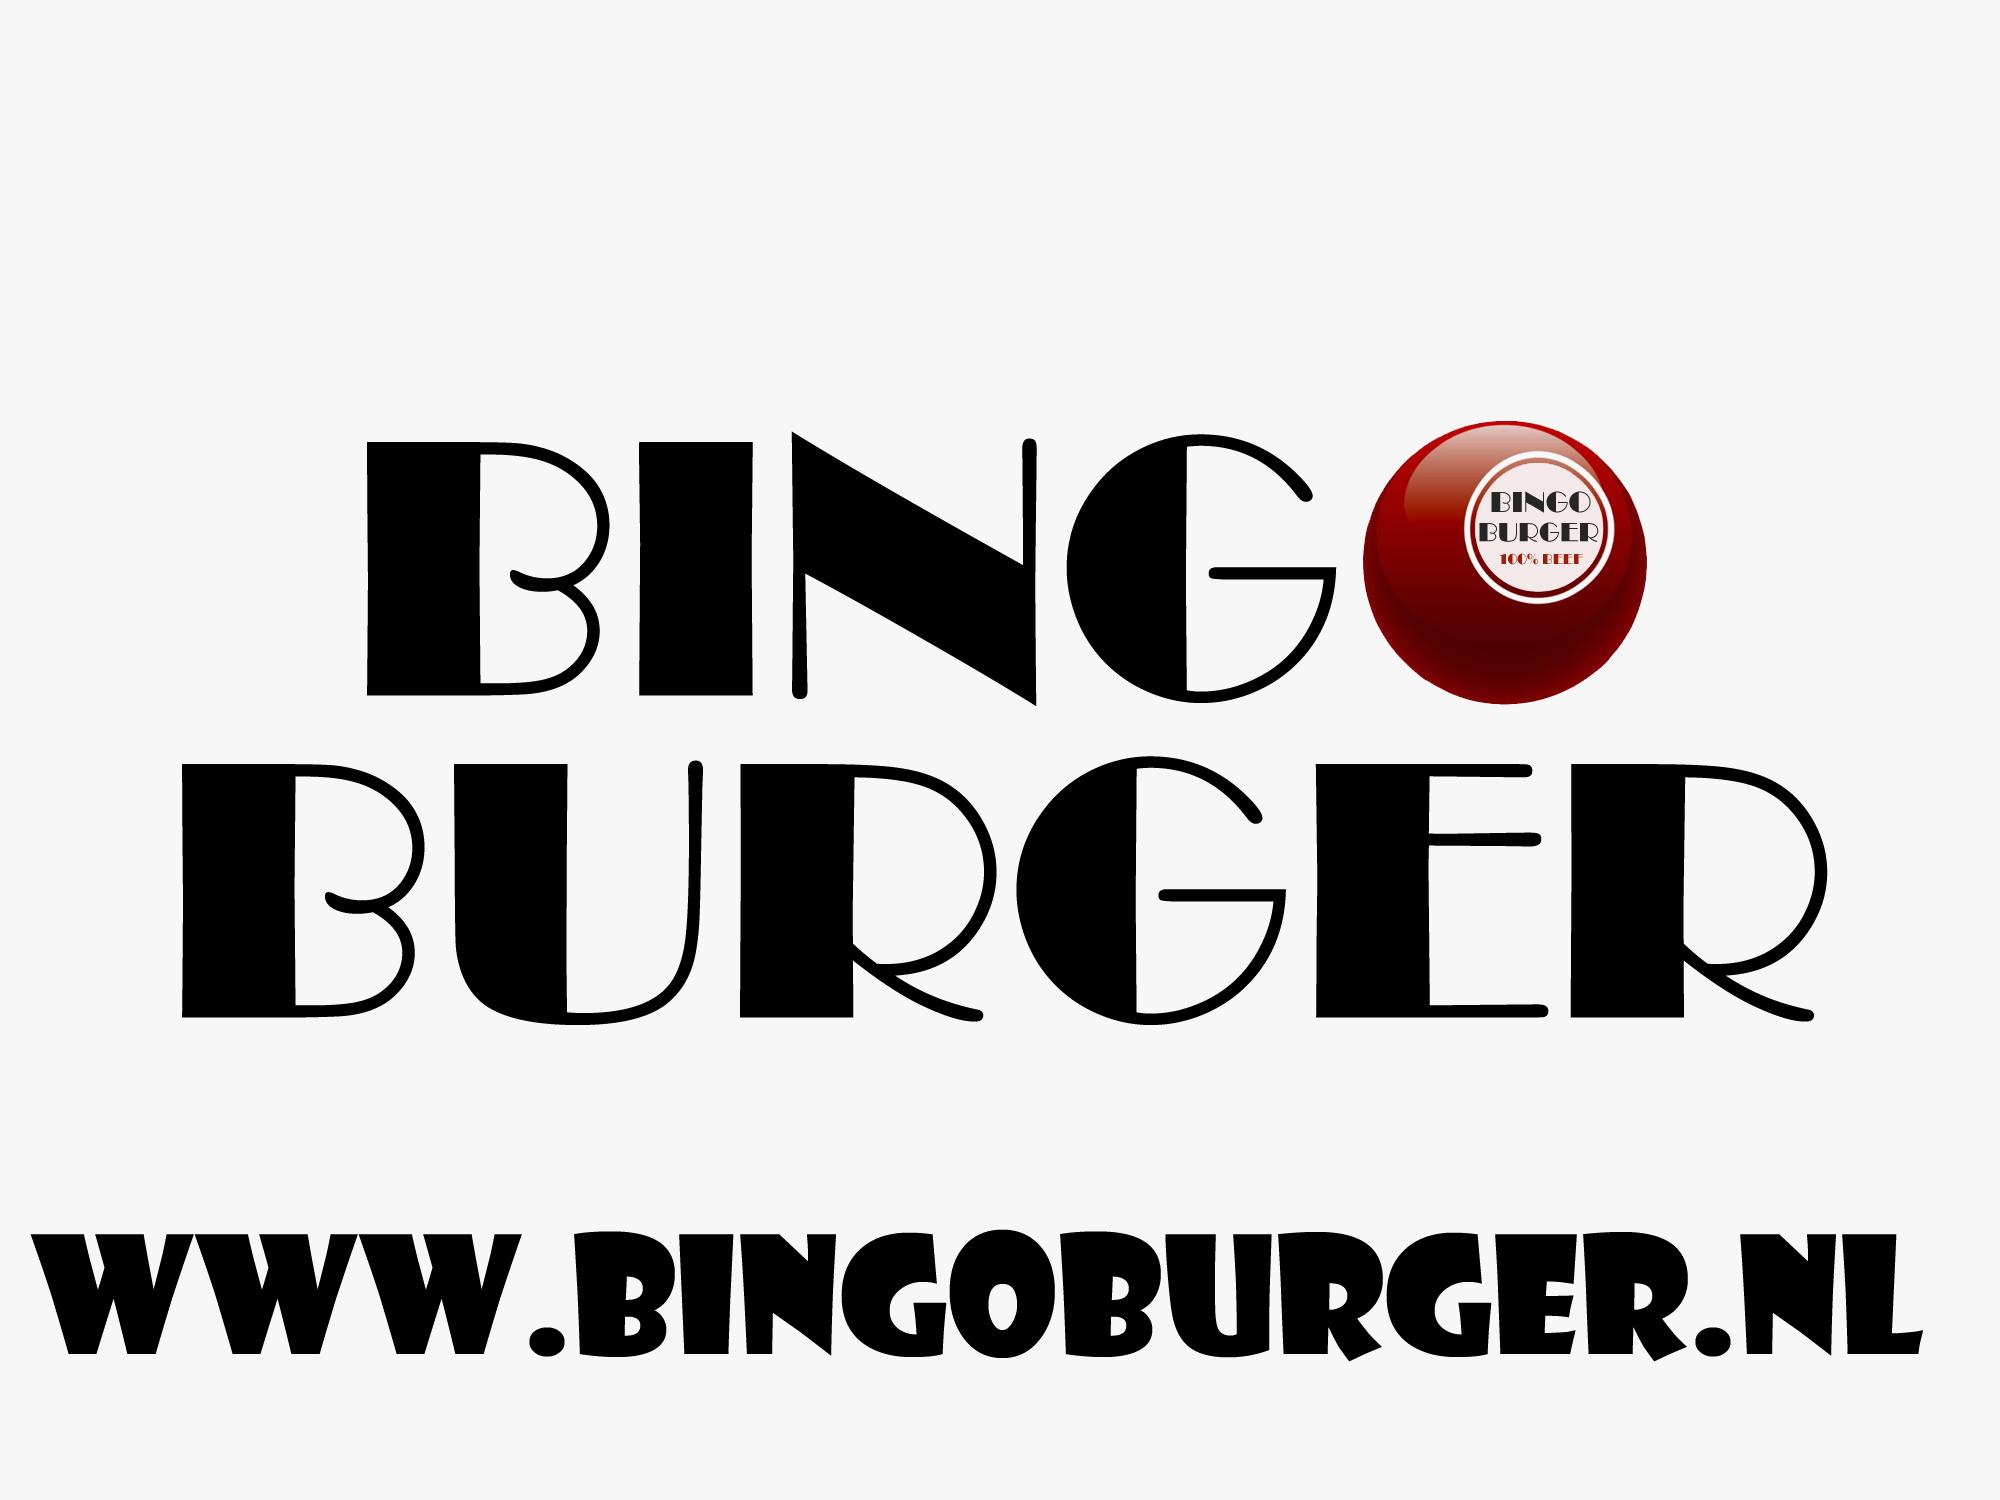 Bingoburger